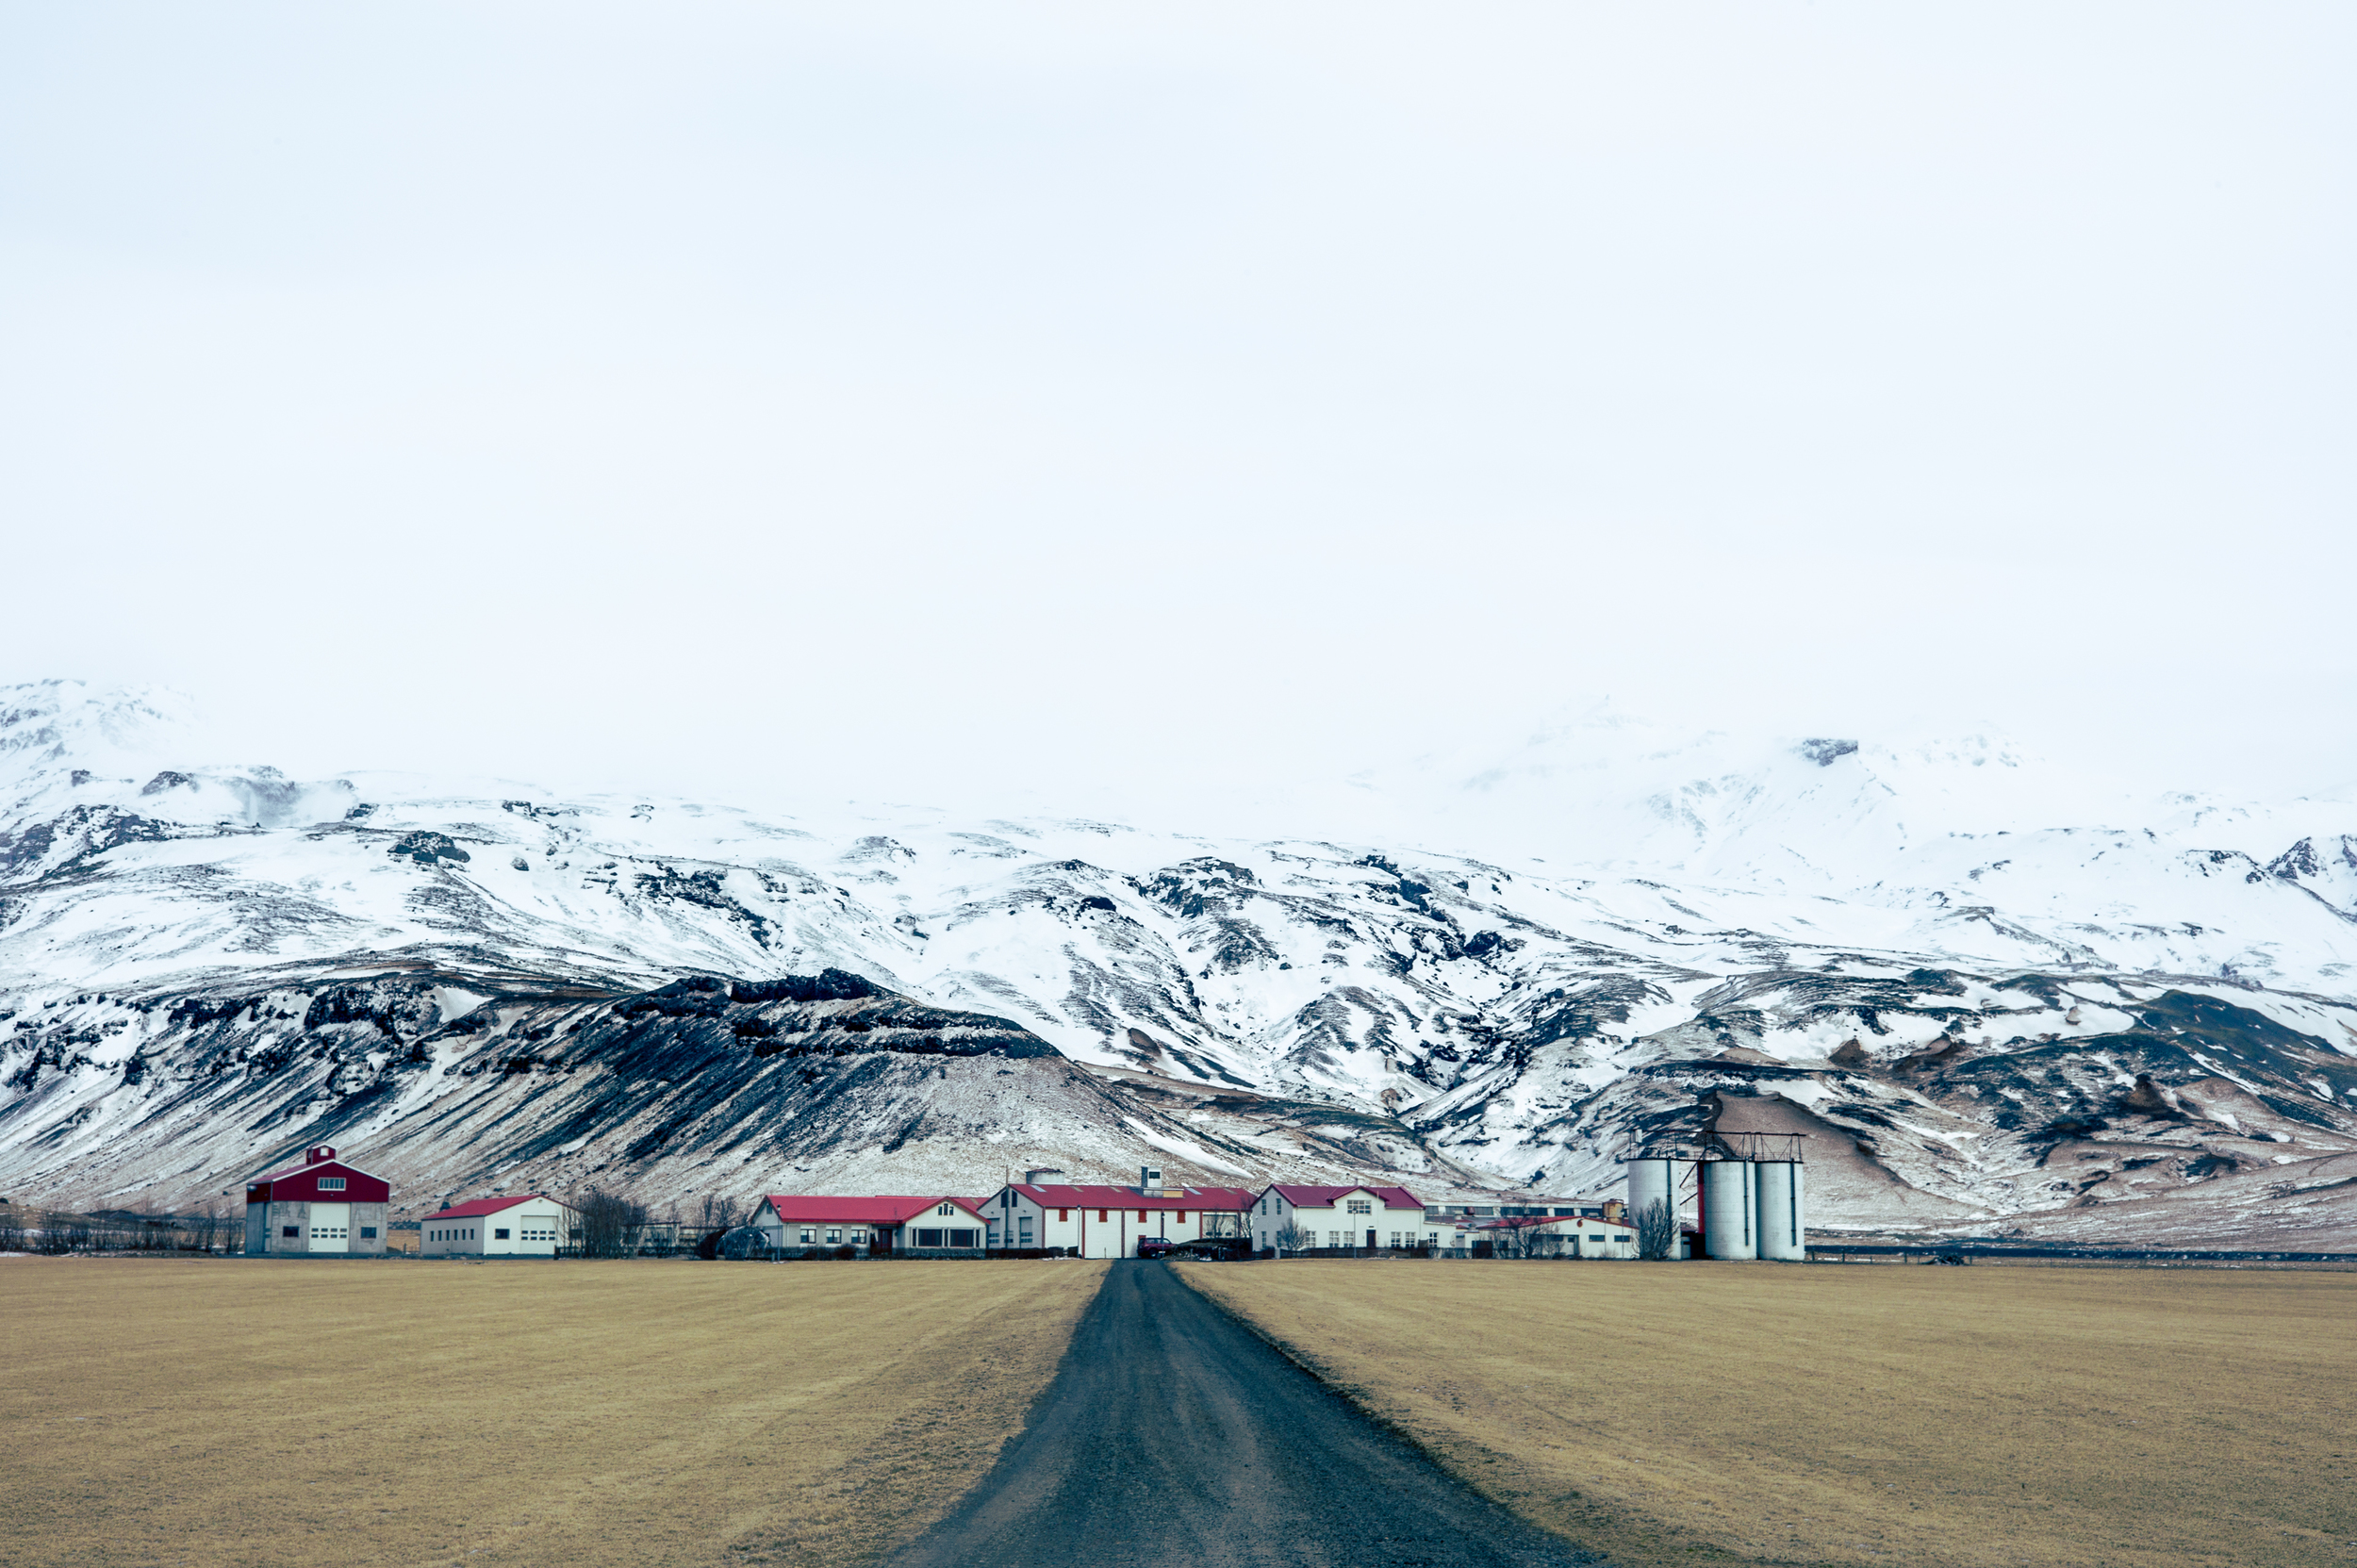 Farm near Eyjafjallajökull